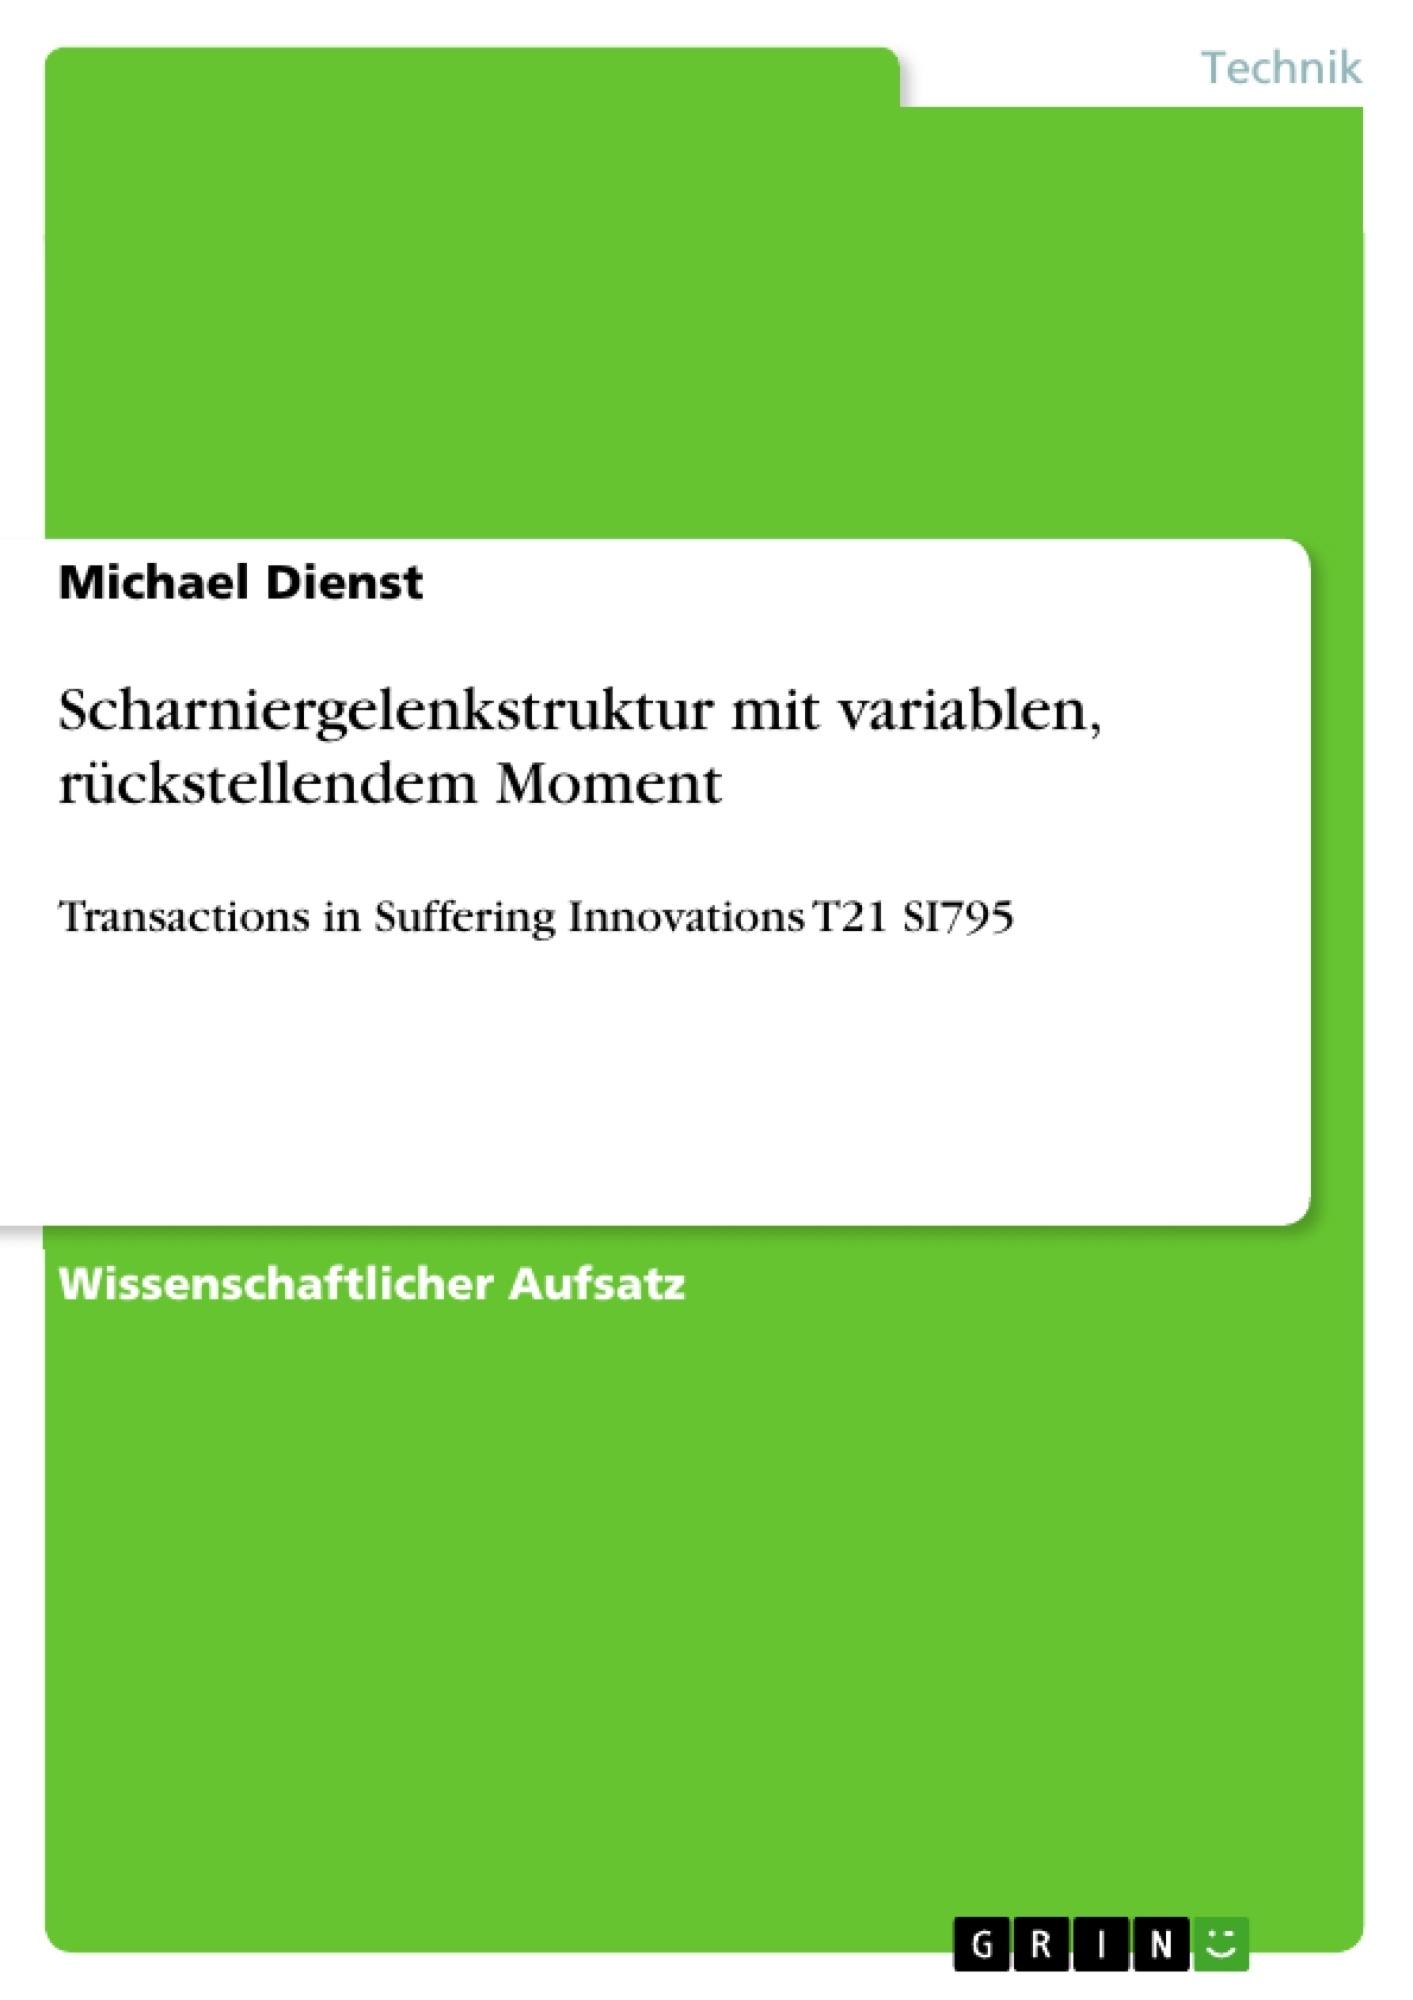 Titel: Scharniergelenkstruktur mit variablen, rückstellendem Moment